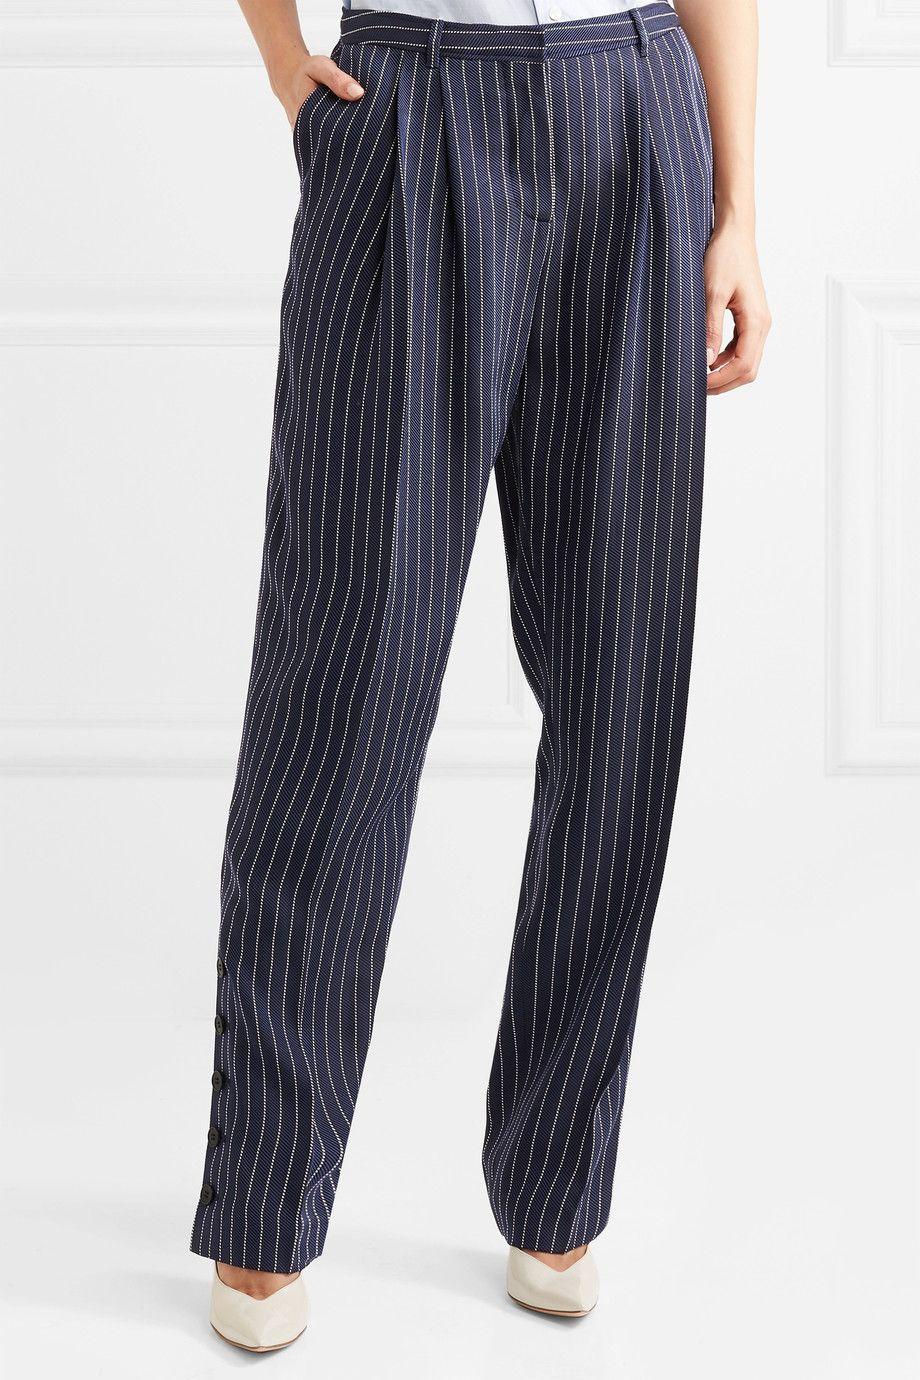 Lidig Pinstriped Ottoman Wide-leg Pants - Blue Altuzarra rWZSoZ